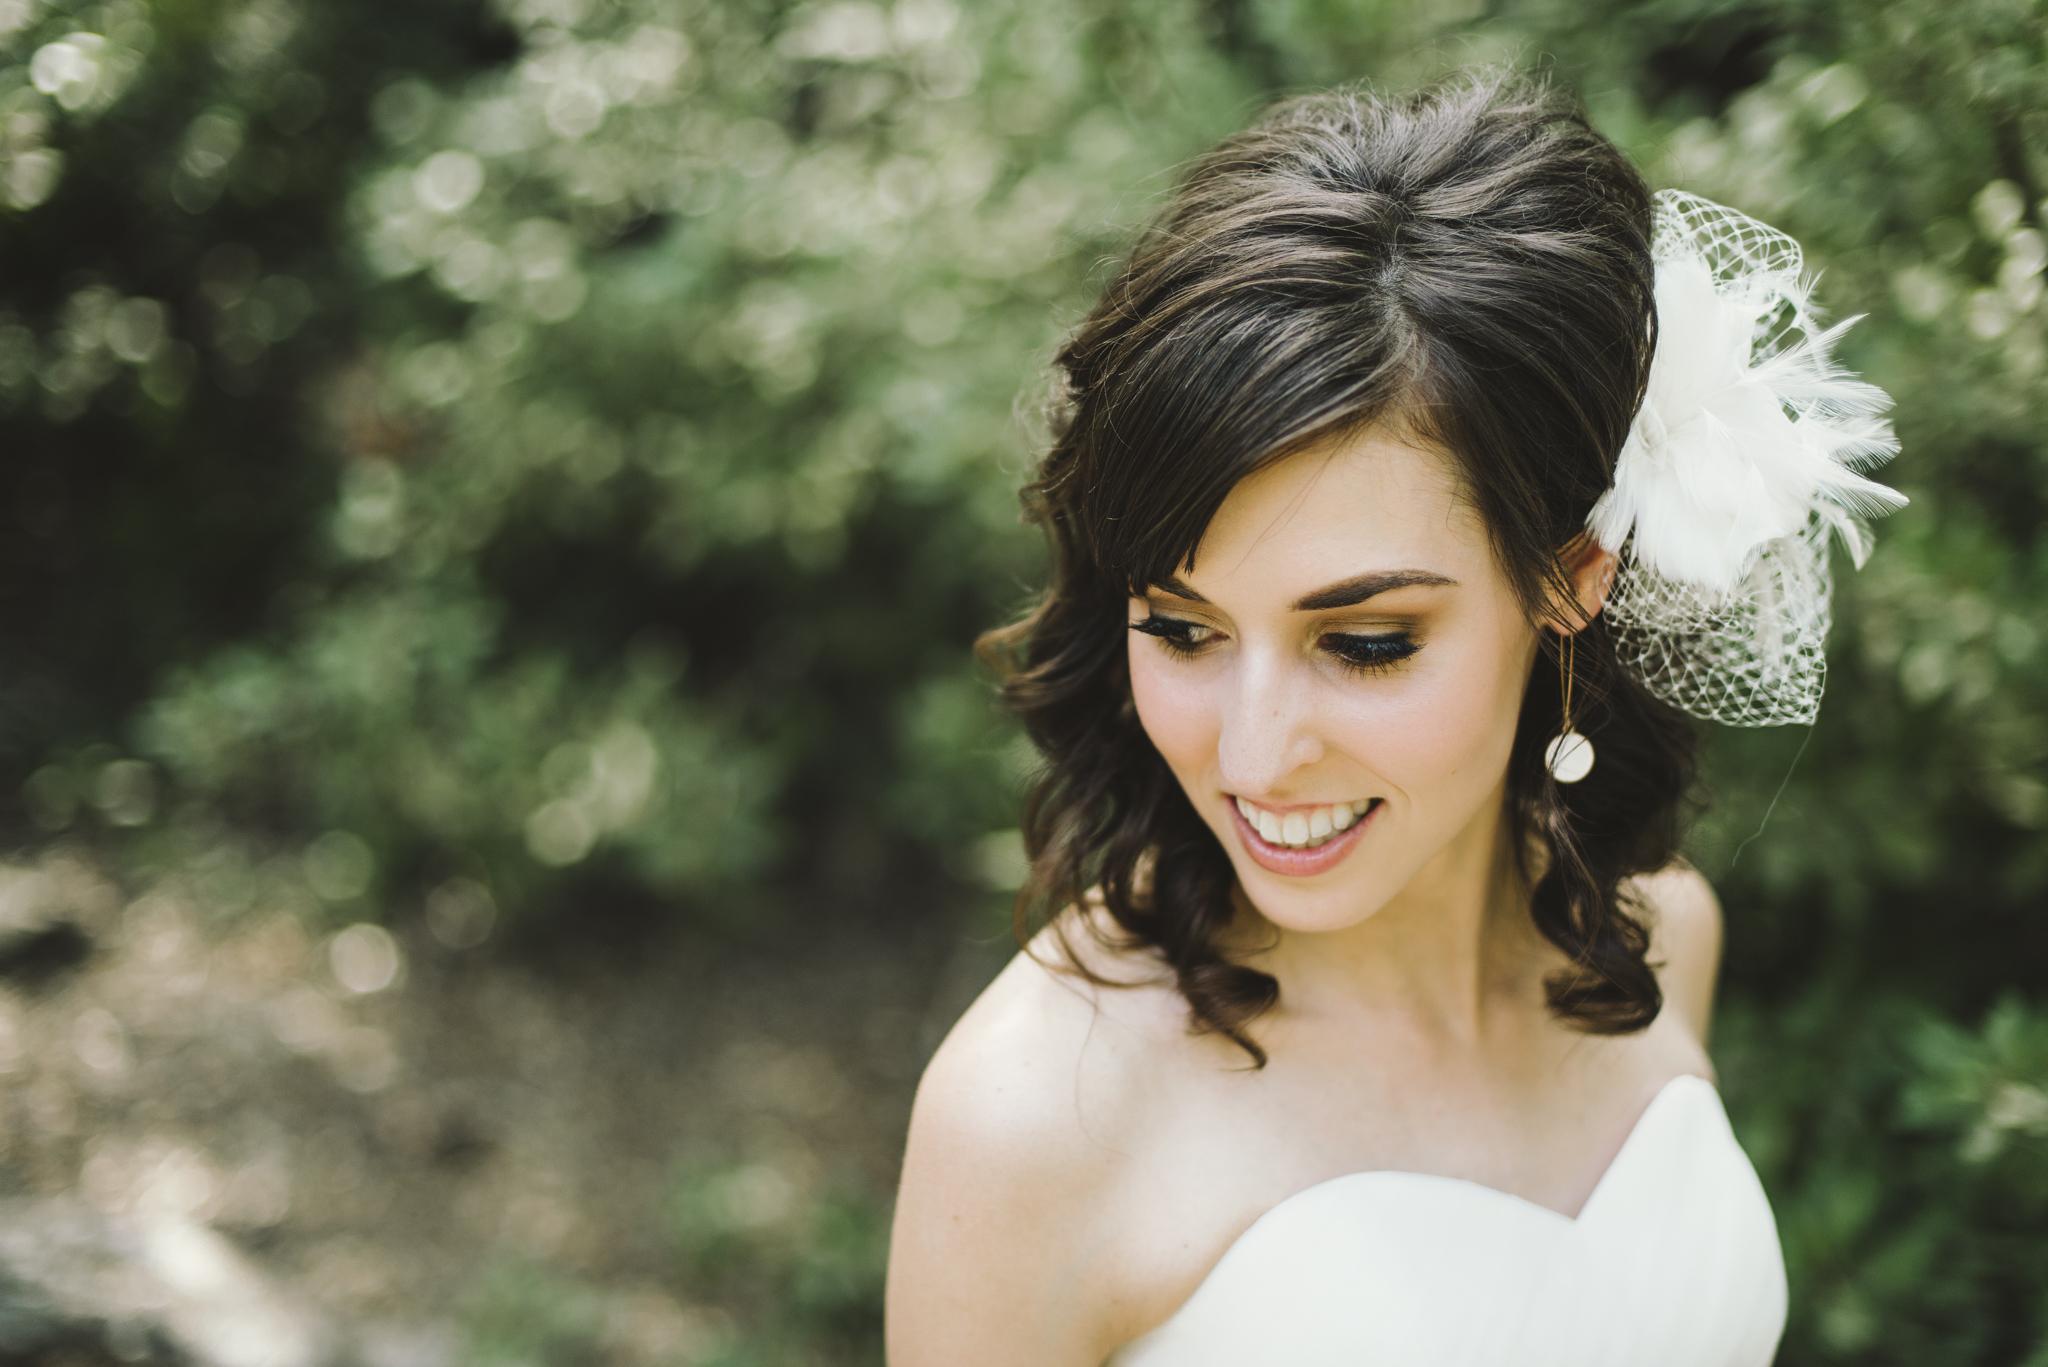 Isaiah & Taylor Photography - Los Angeles Lifestyle Wedding Photographer-3.jpg